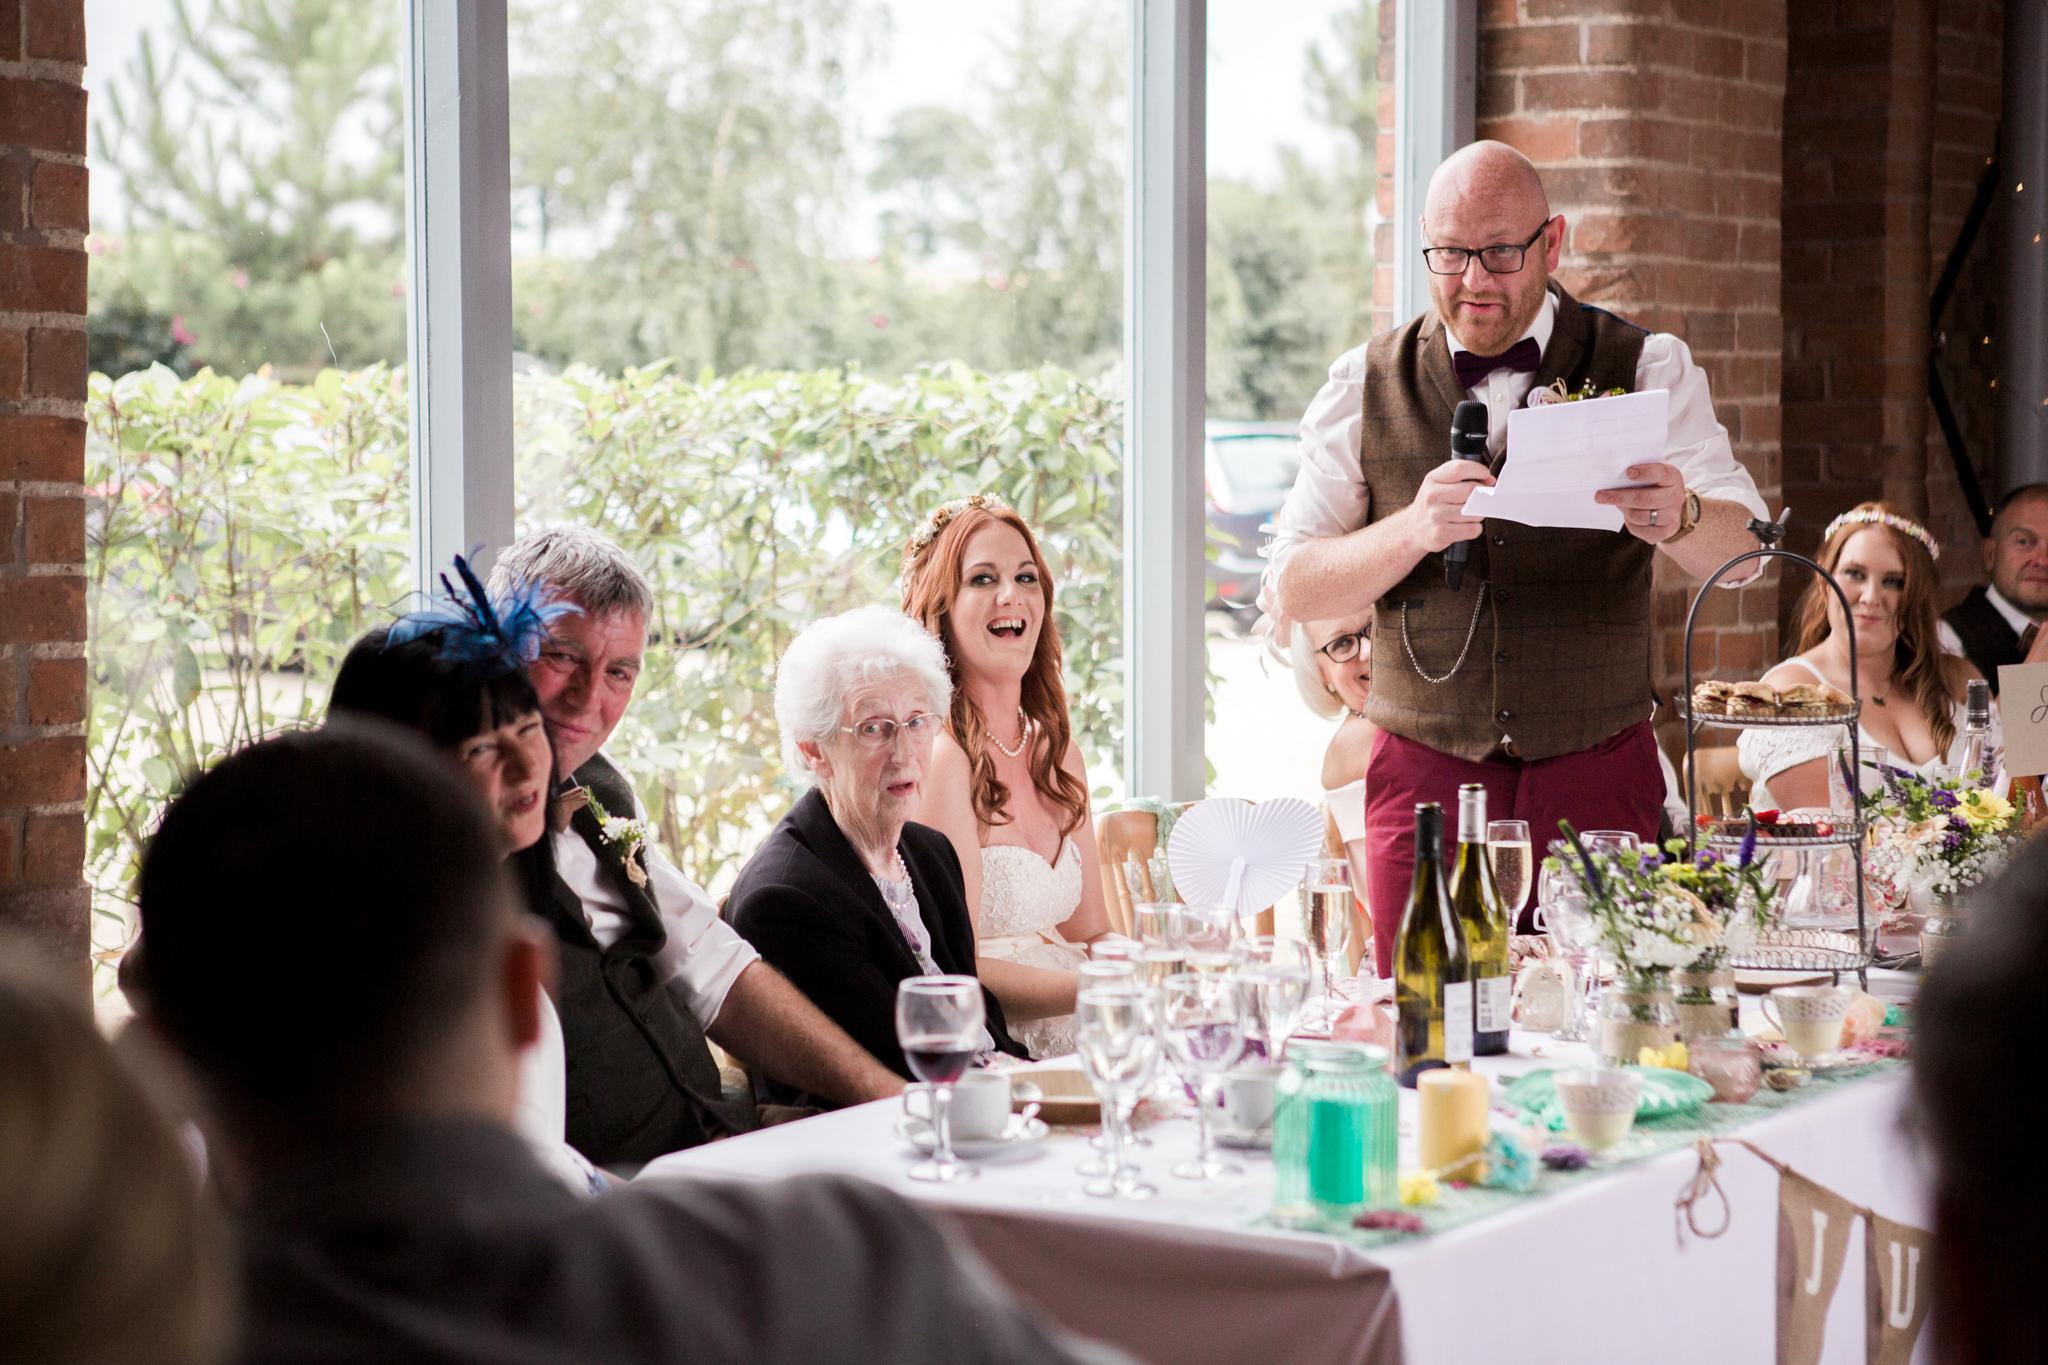 Rowsie & Lee, Swallows Nest Barn Wedding, Cotswold wedding photographer, Warwickshire Wedding Photographer-135.jpg